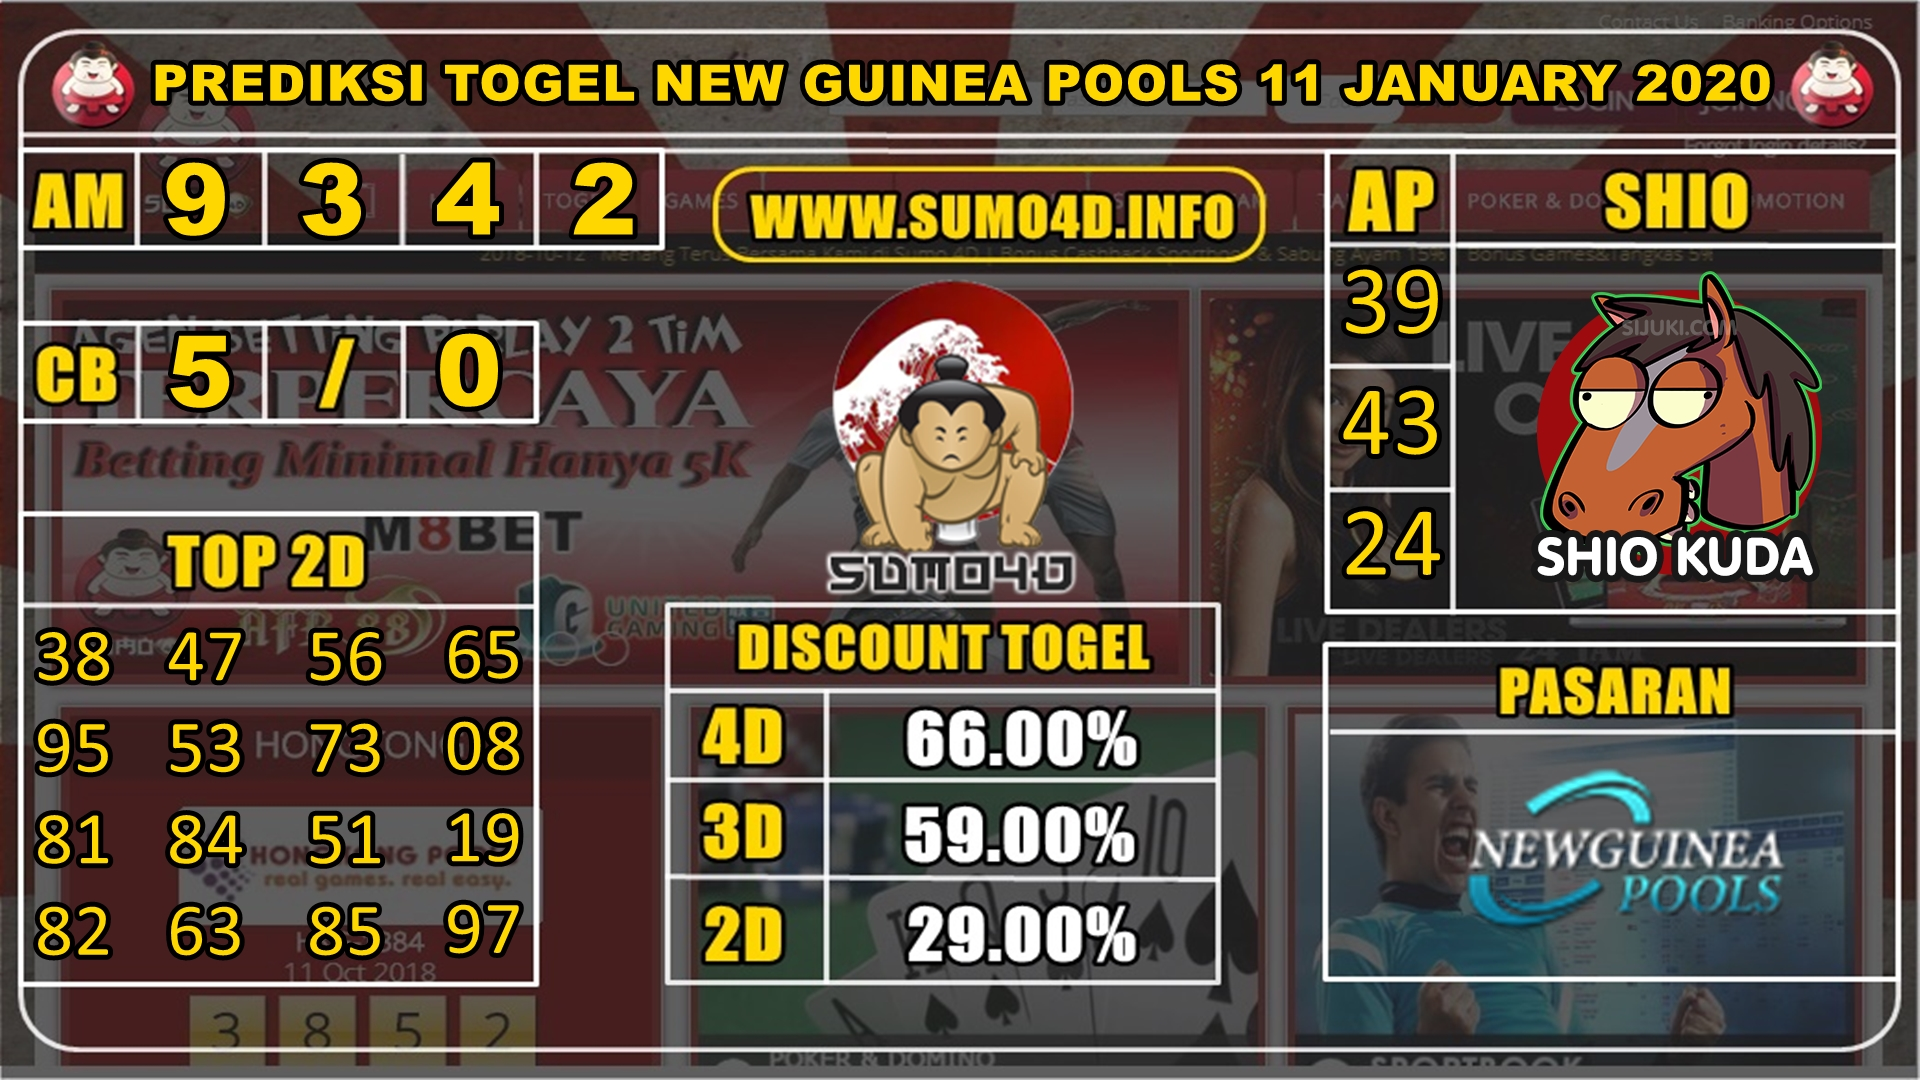 PREDIKSI TOGEL NEW GUINEA POOLS 11 JANUARY 2020